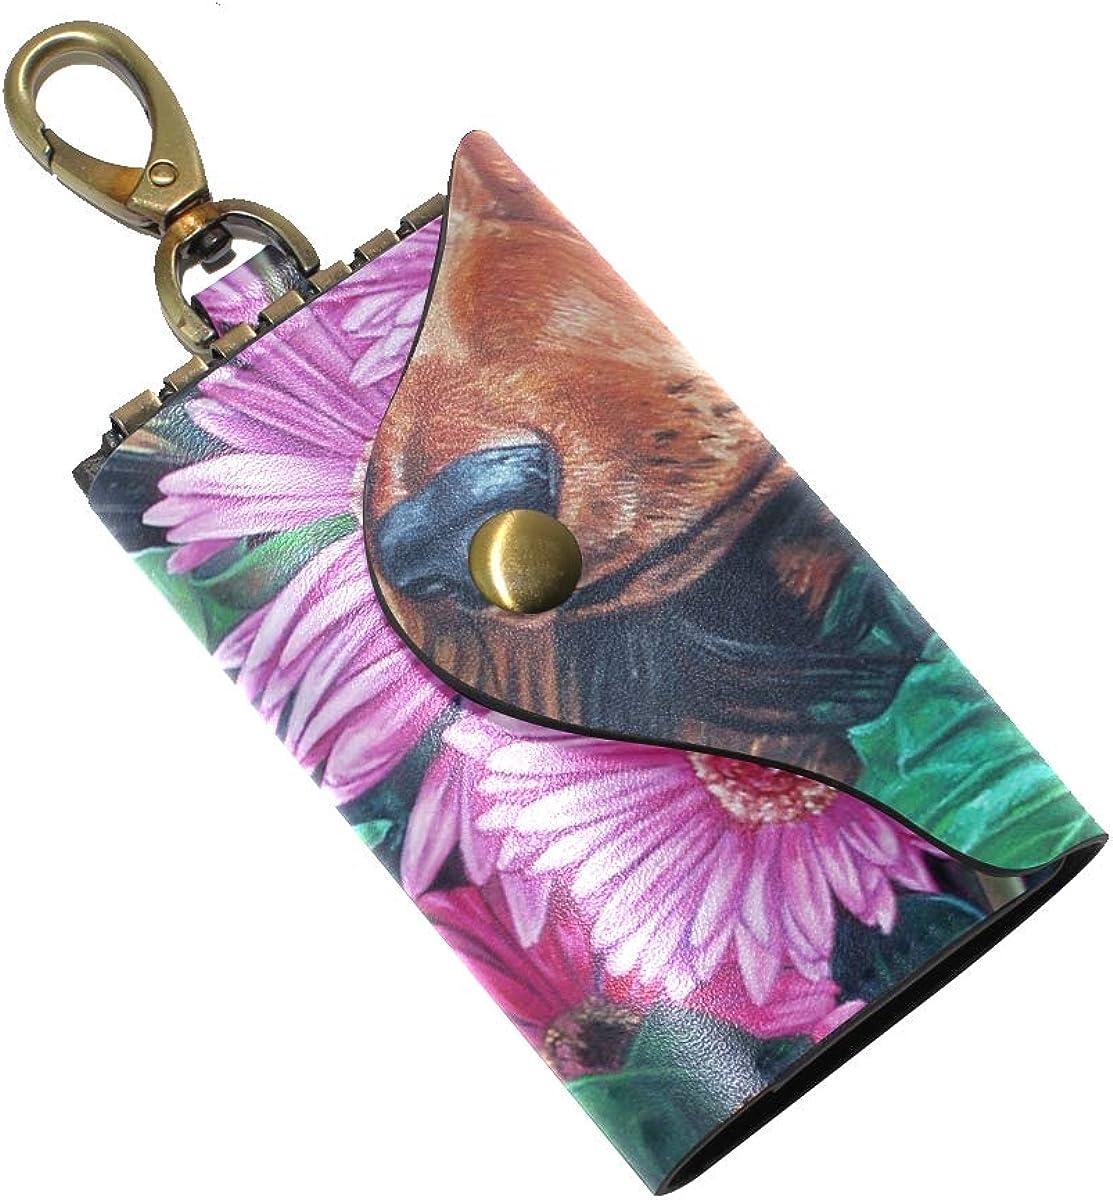 KEAKIA Garden Dog Flower Leather Key Case Wallets Tri-fold Key Holder Keychains with 6 Hooks 2 Slot Snap Closure for Men Women